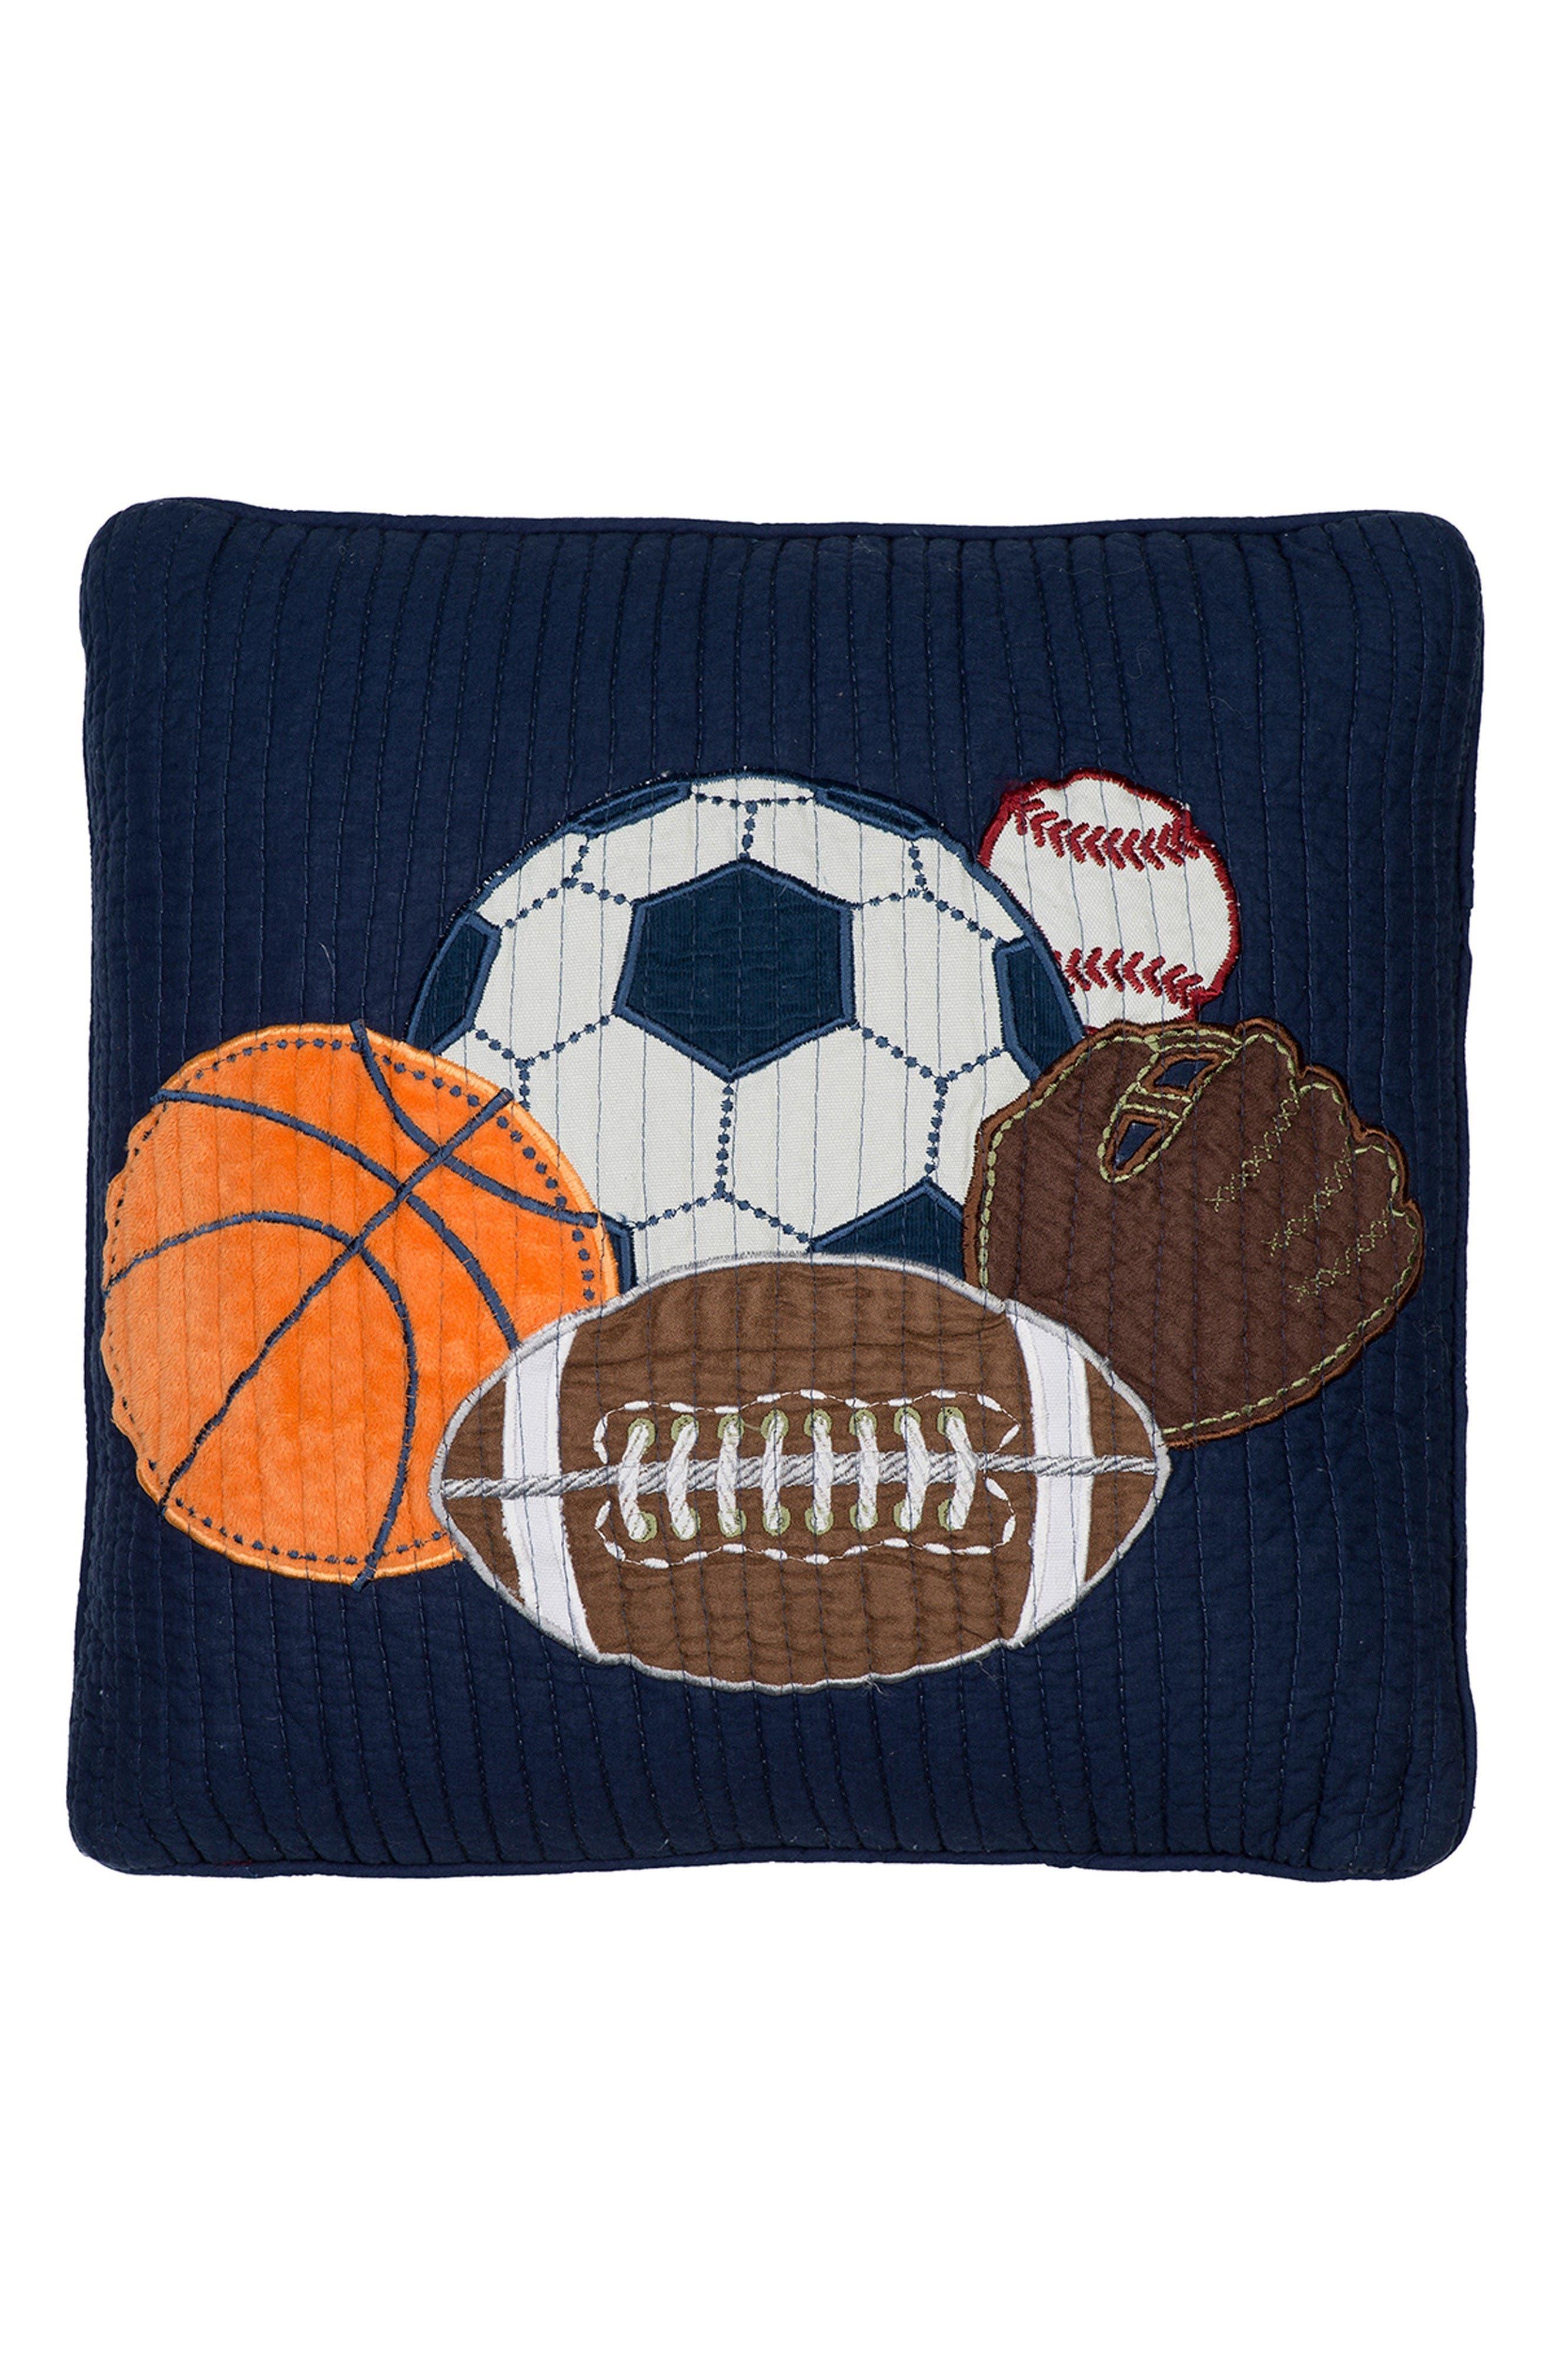 Main Image - Levtex Ivan Sports Accent Pillow